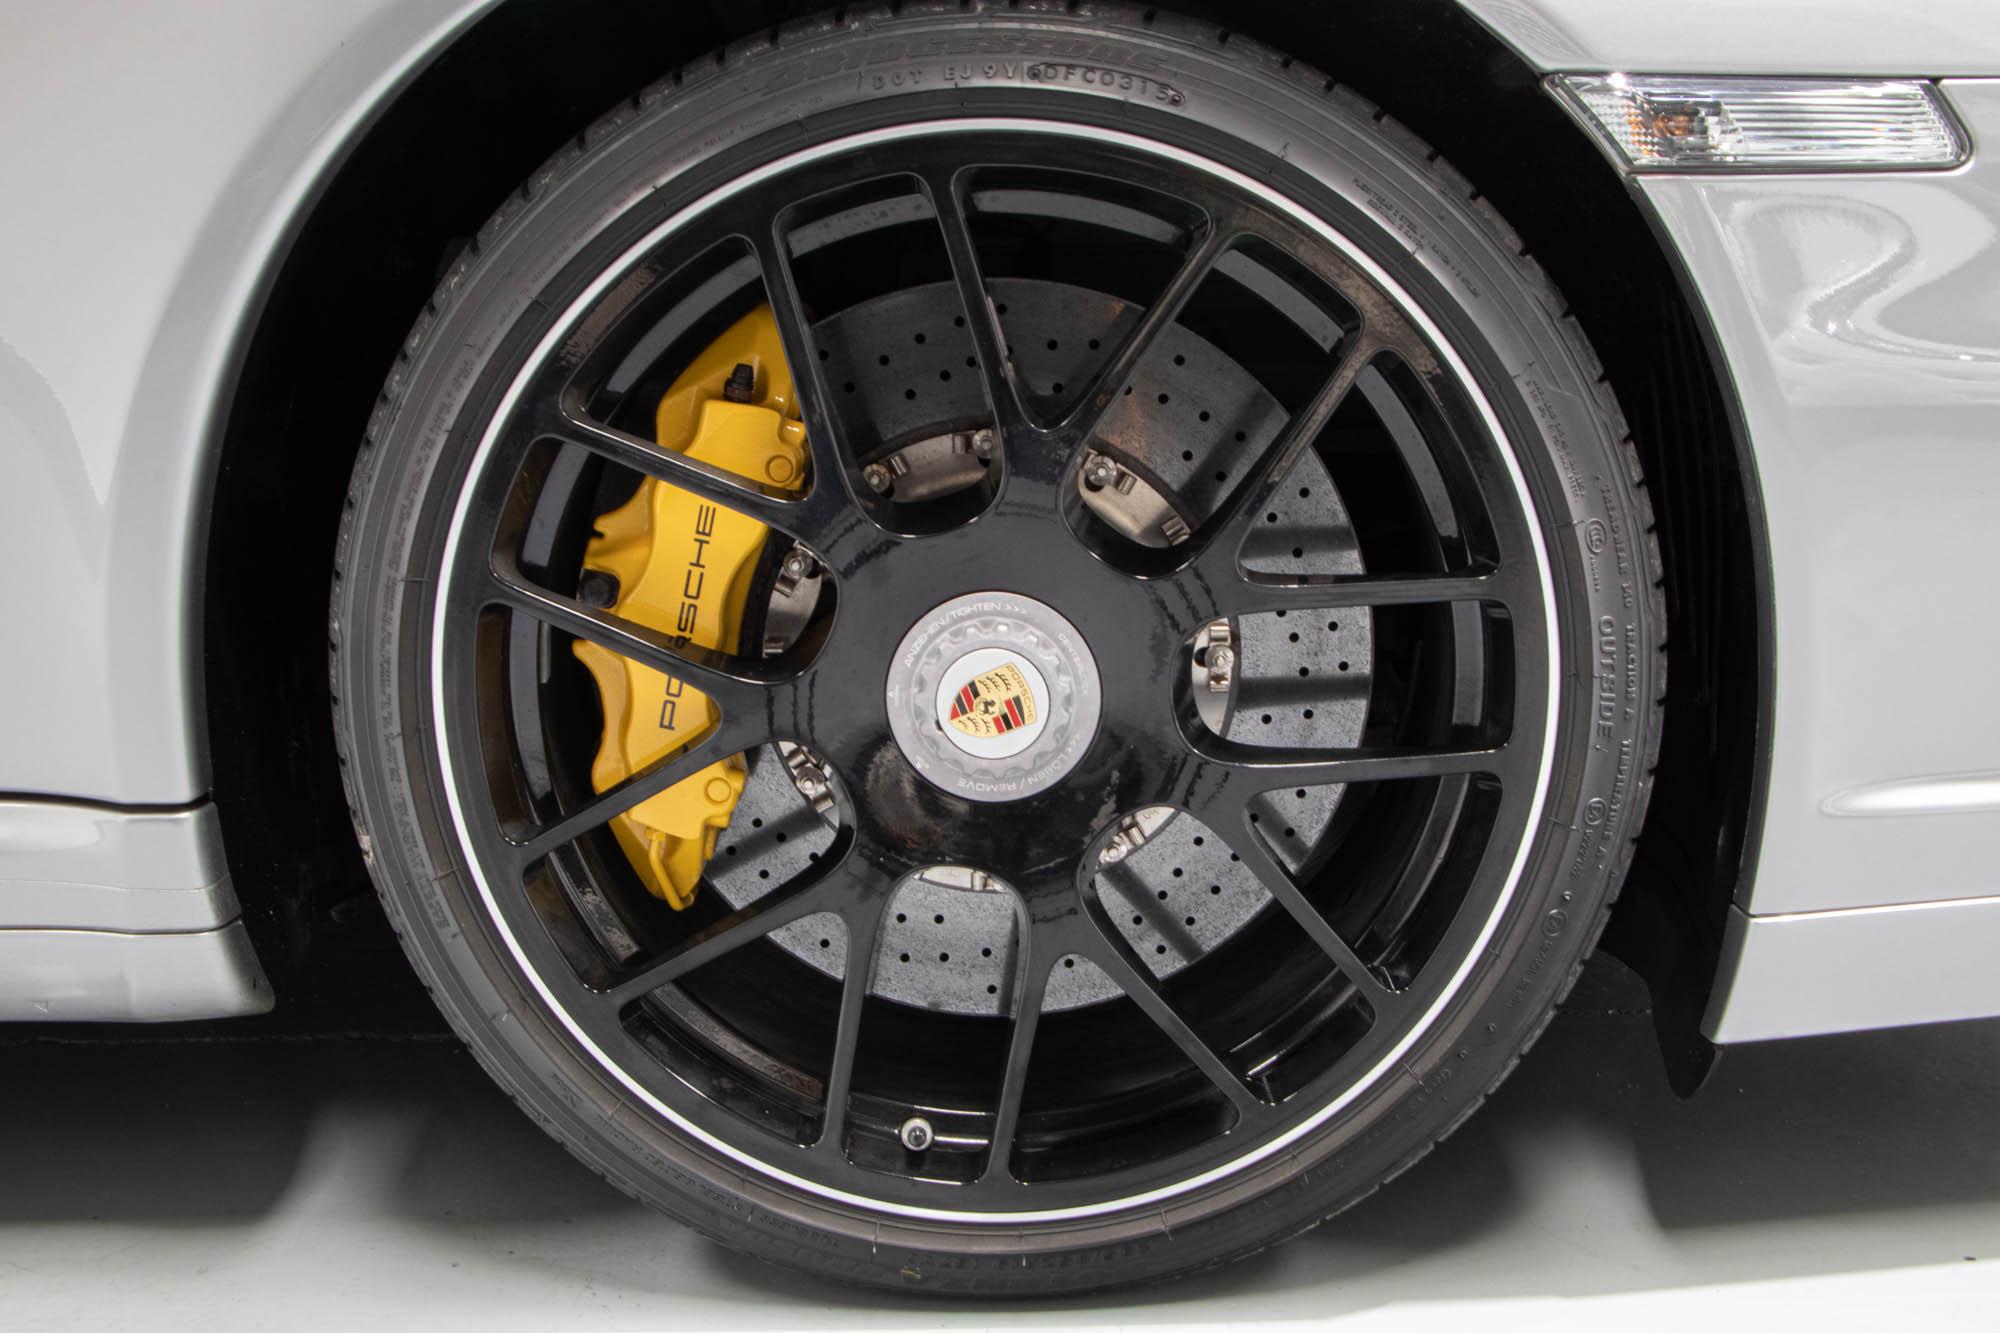 997.2 Turbo S Silv-11